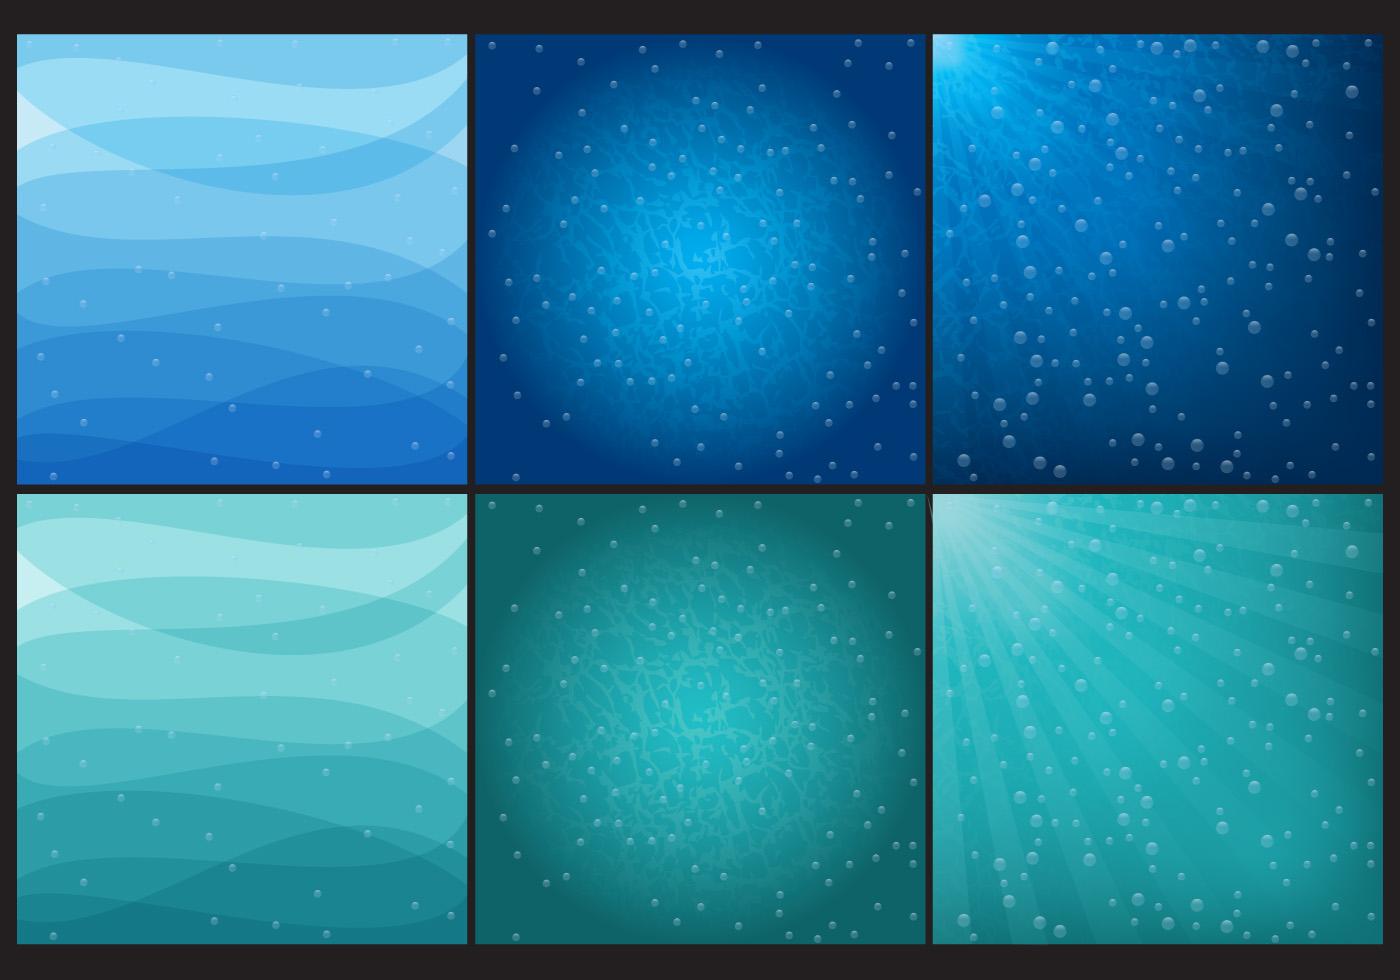 Cute Aqua Green Wallpaper Blue And Green Water Backgrounds Download Free Vector